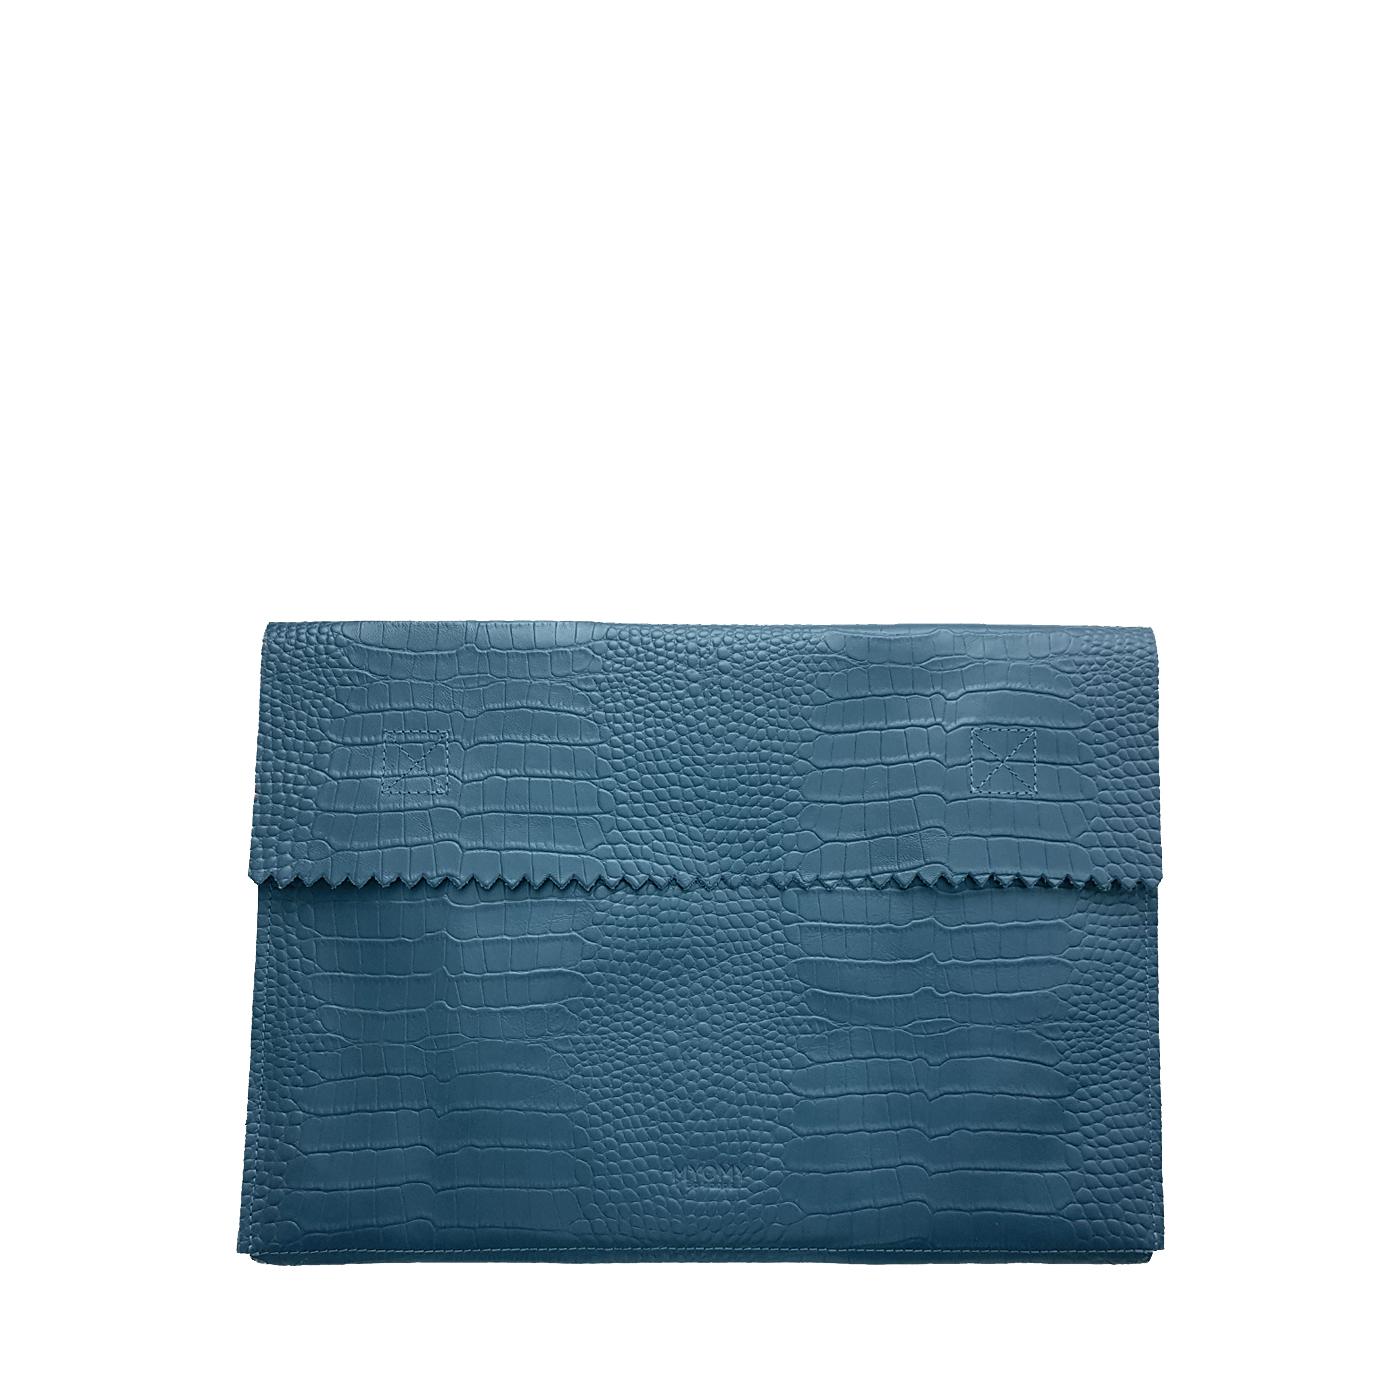 MY PAPER BAG Laptop sleeve - croco denim blue